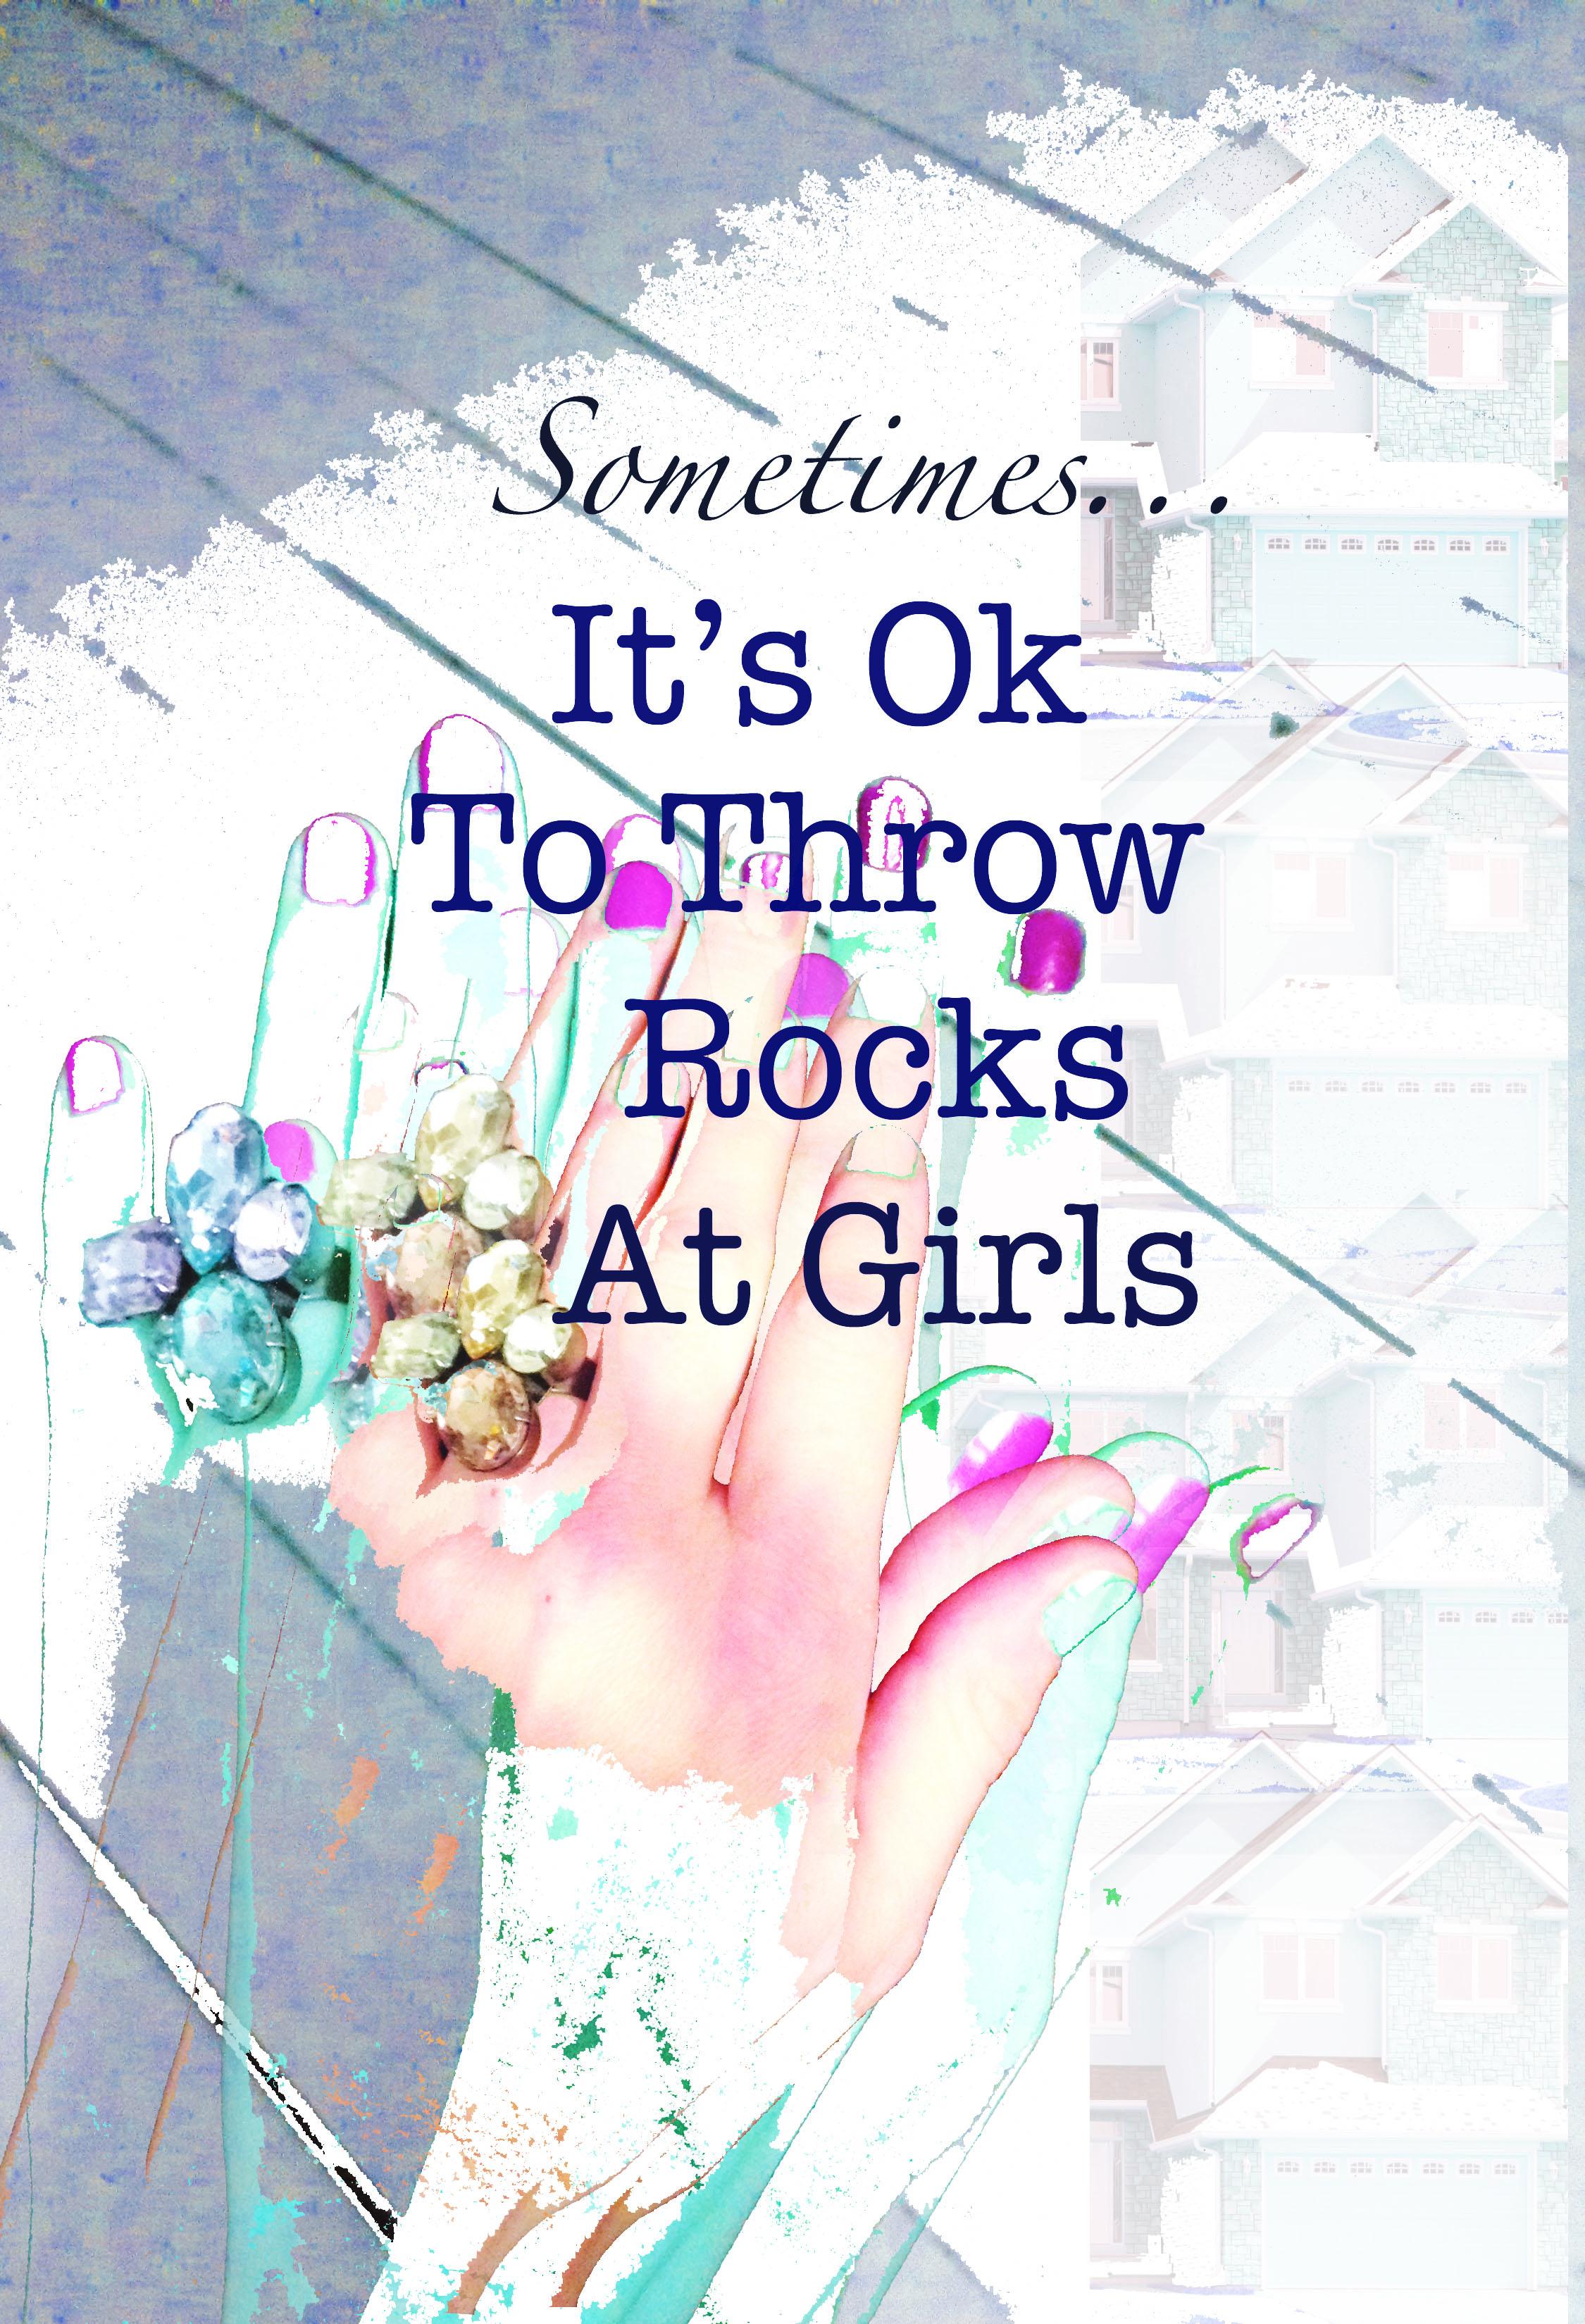 It's Ok To Throw Rocks at Girls